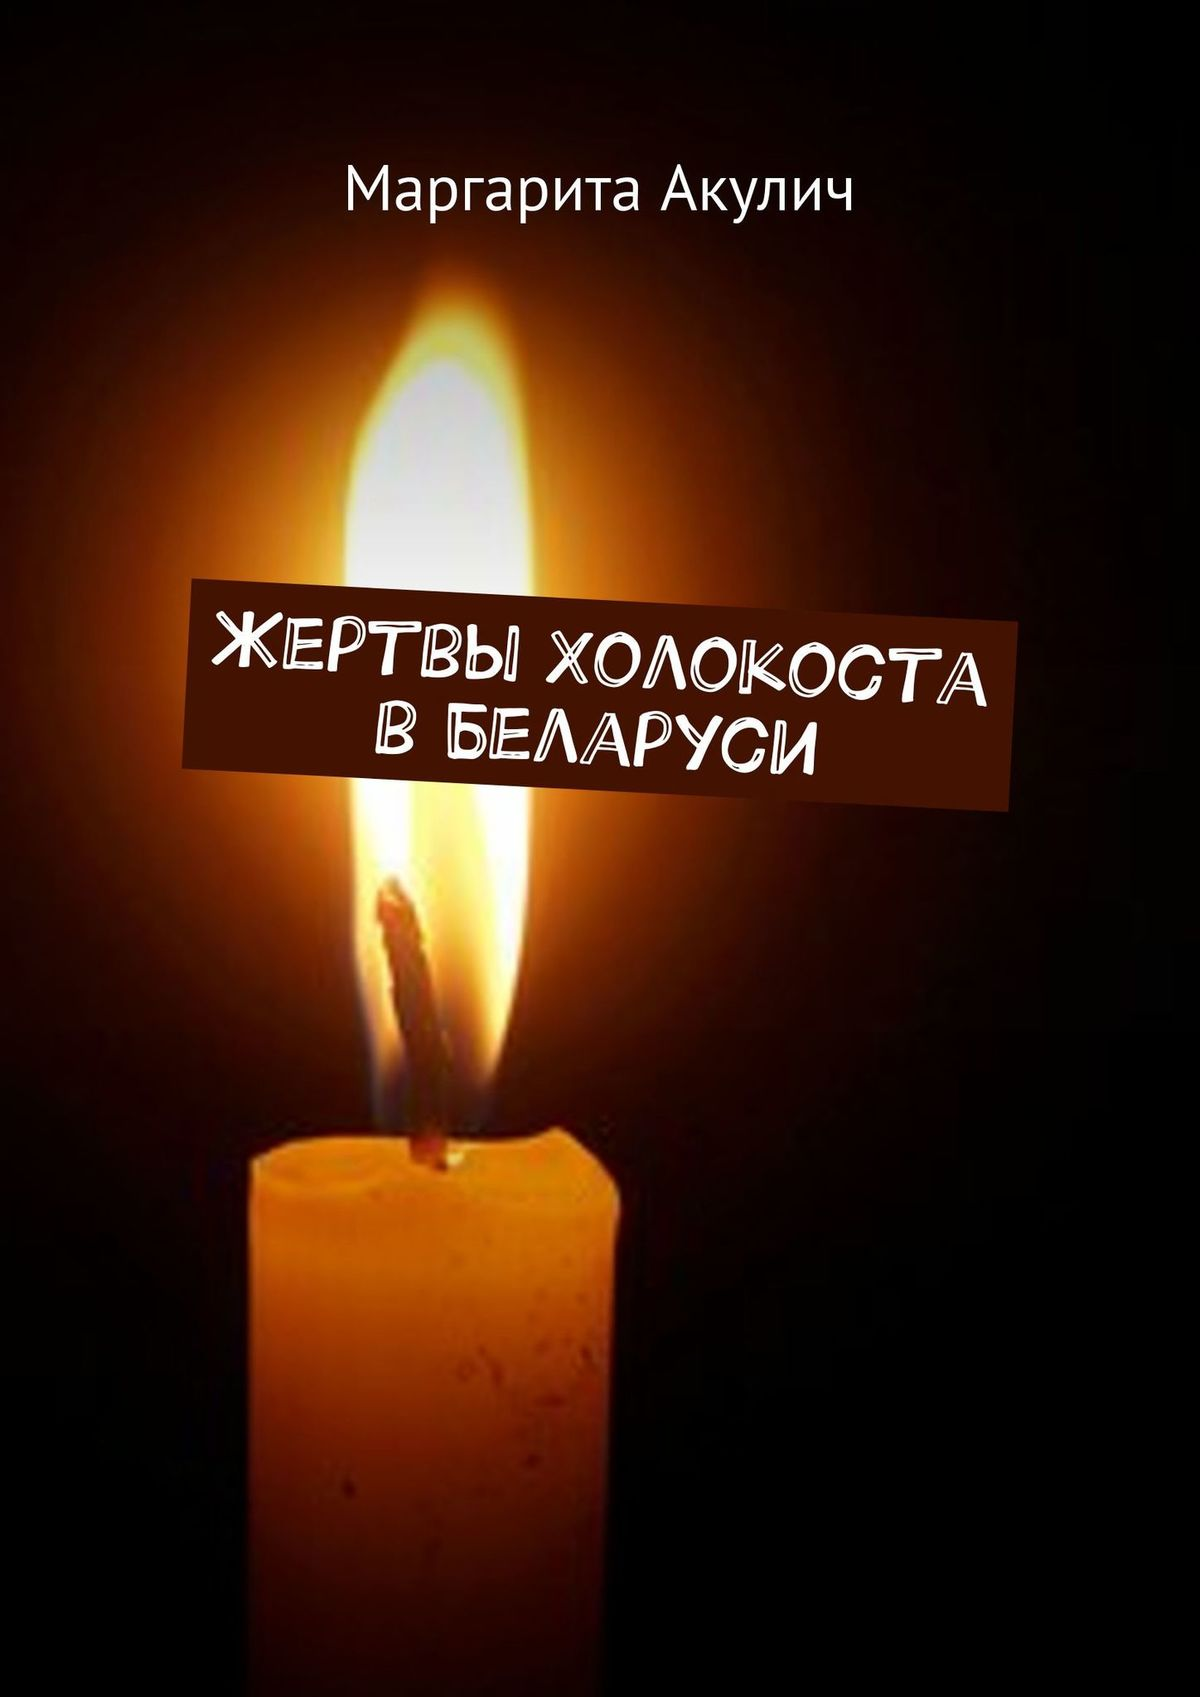 Маргарита Акулич Жертвы Холокоста в Беларуси маргарита акулич о синагогах раввине и